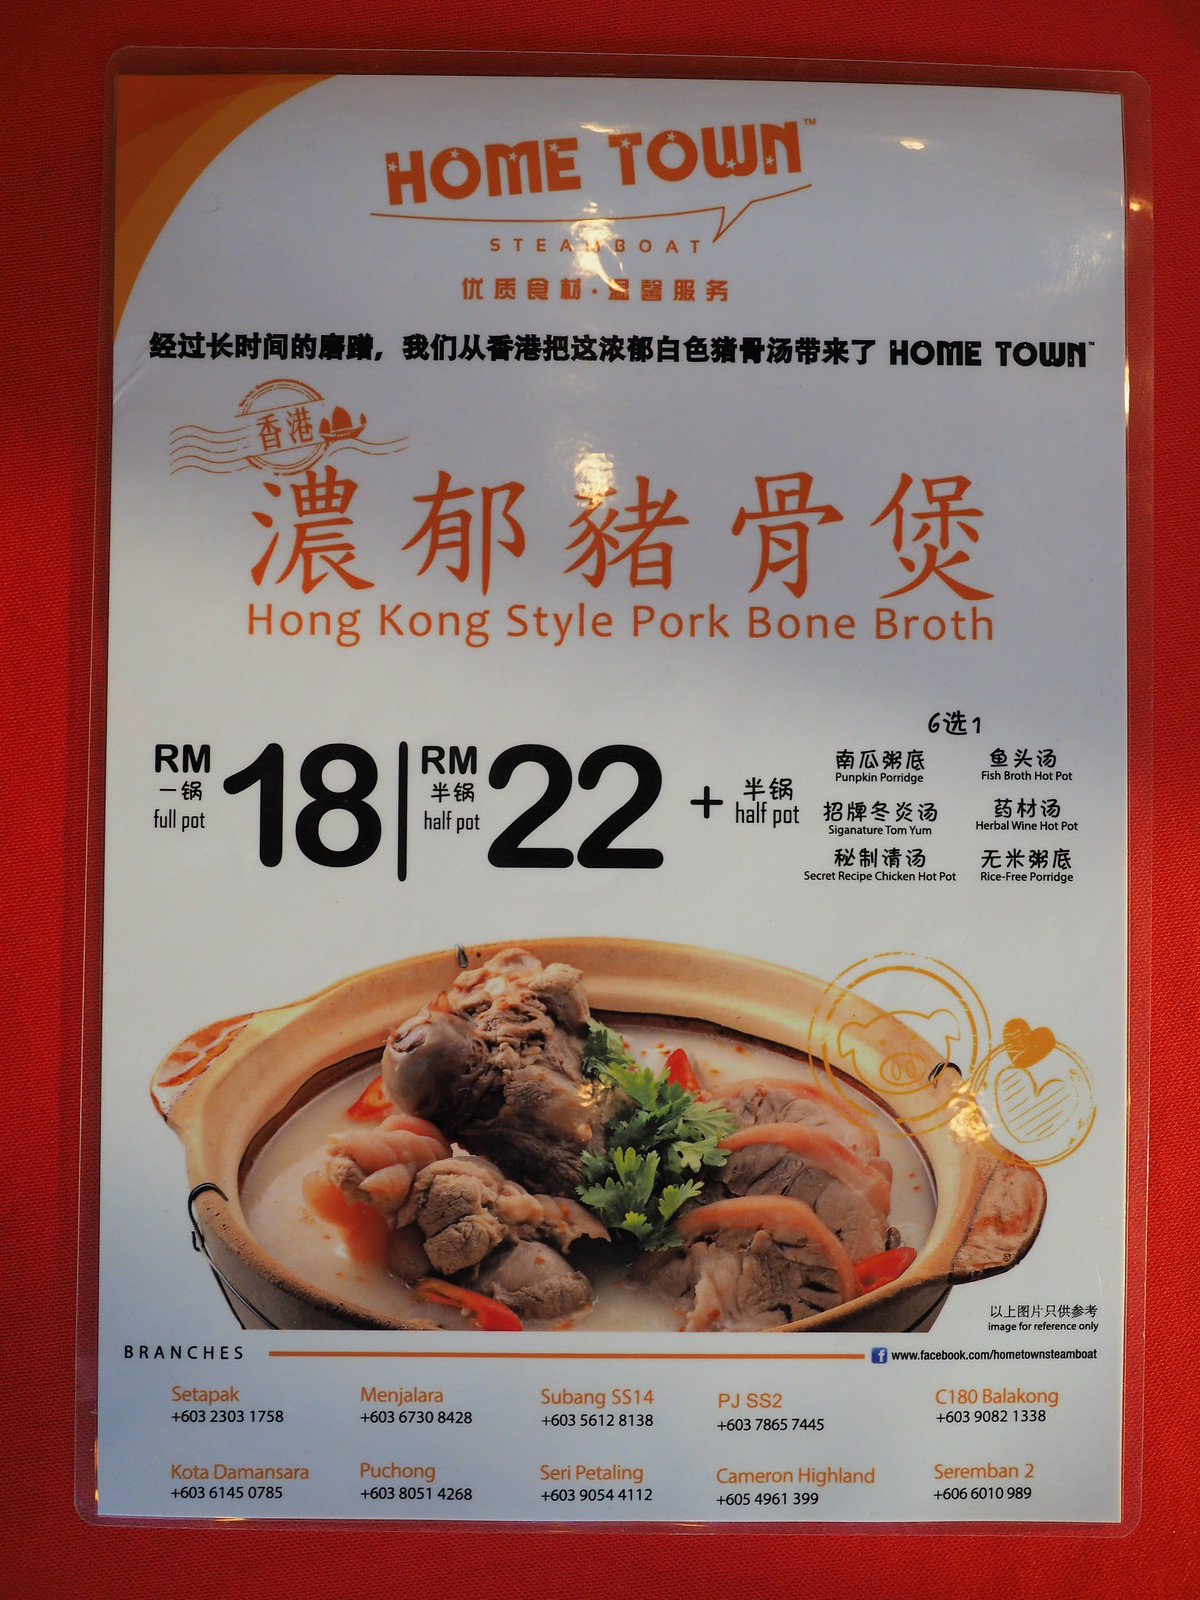 Hometown Steamboat SS2 好家乡火锅世家's Hong Kong Style Pork Bone Broth